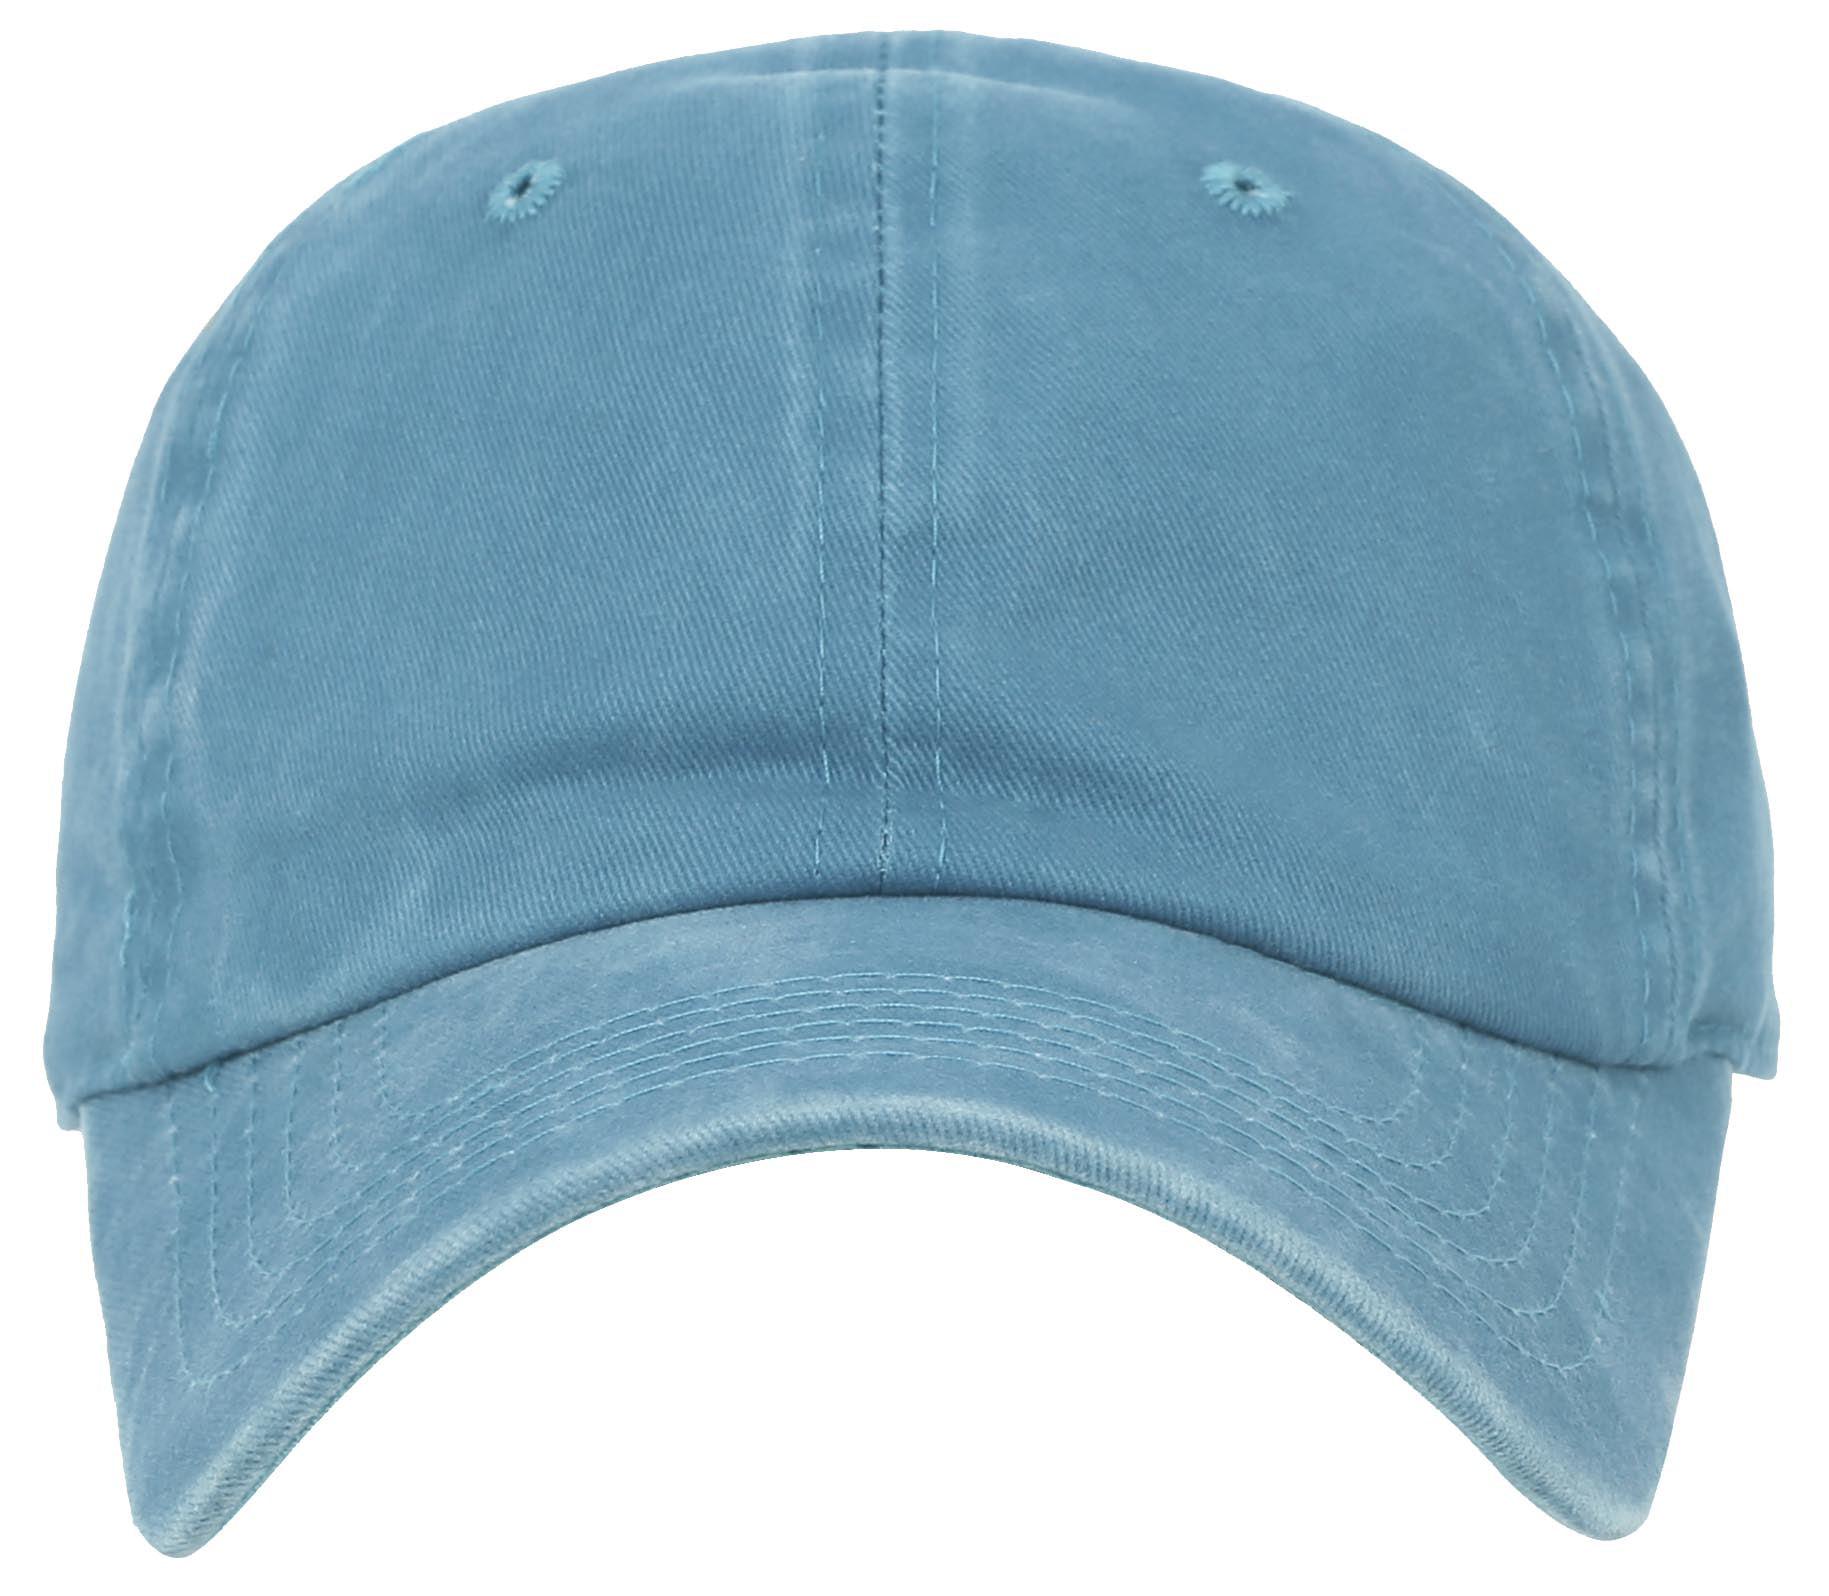 23f8e2f0d66 ... 50% off new york rangers sports fan cap hats ebay plain dad hat 100  cotton